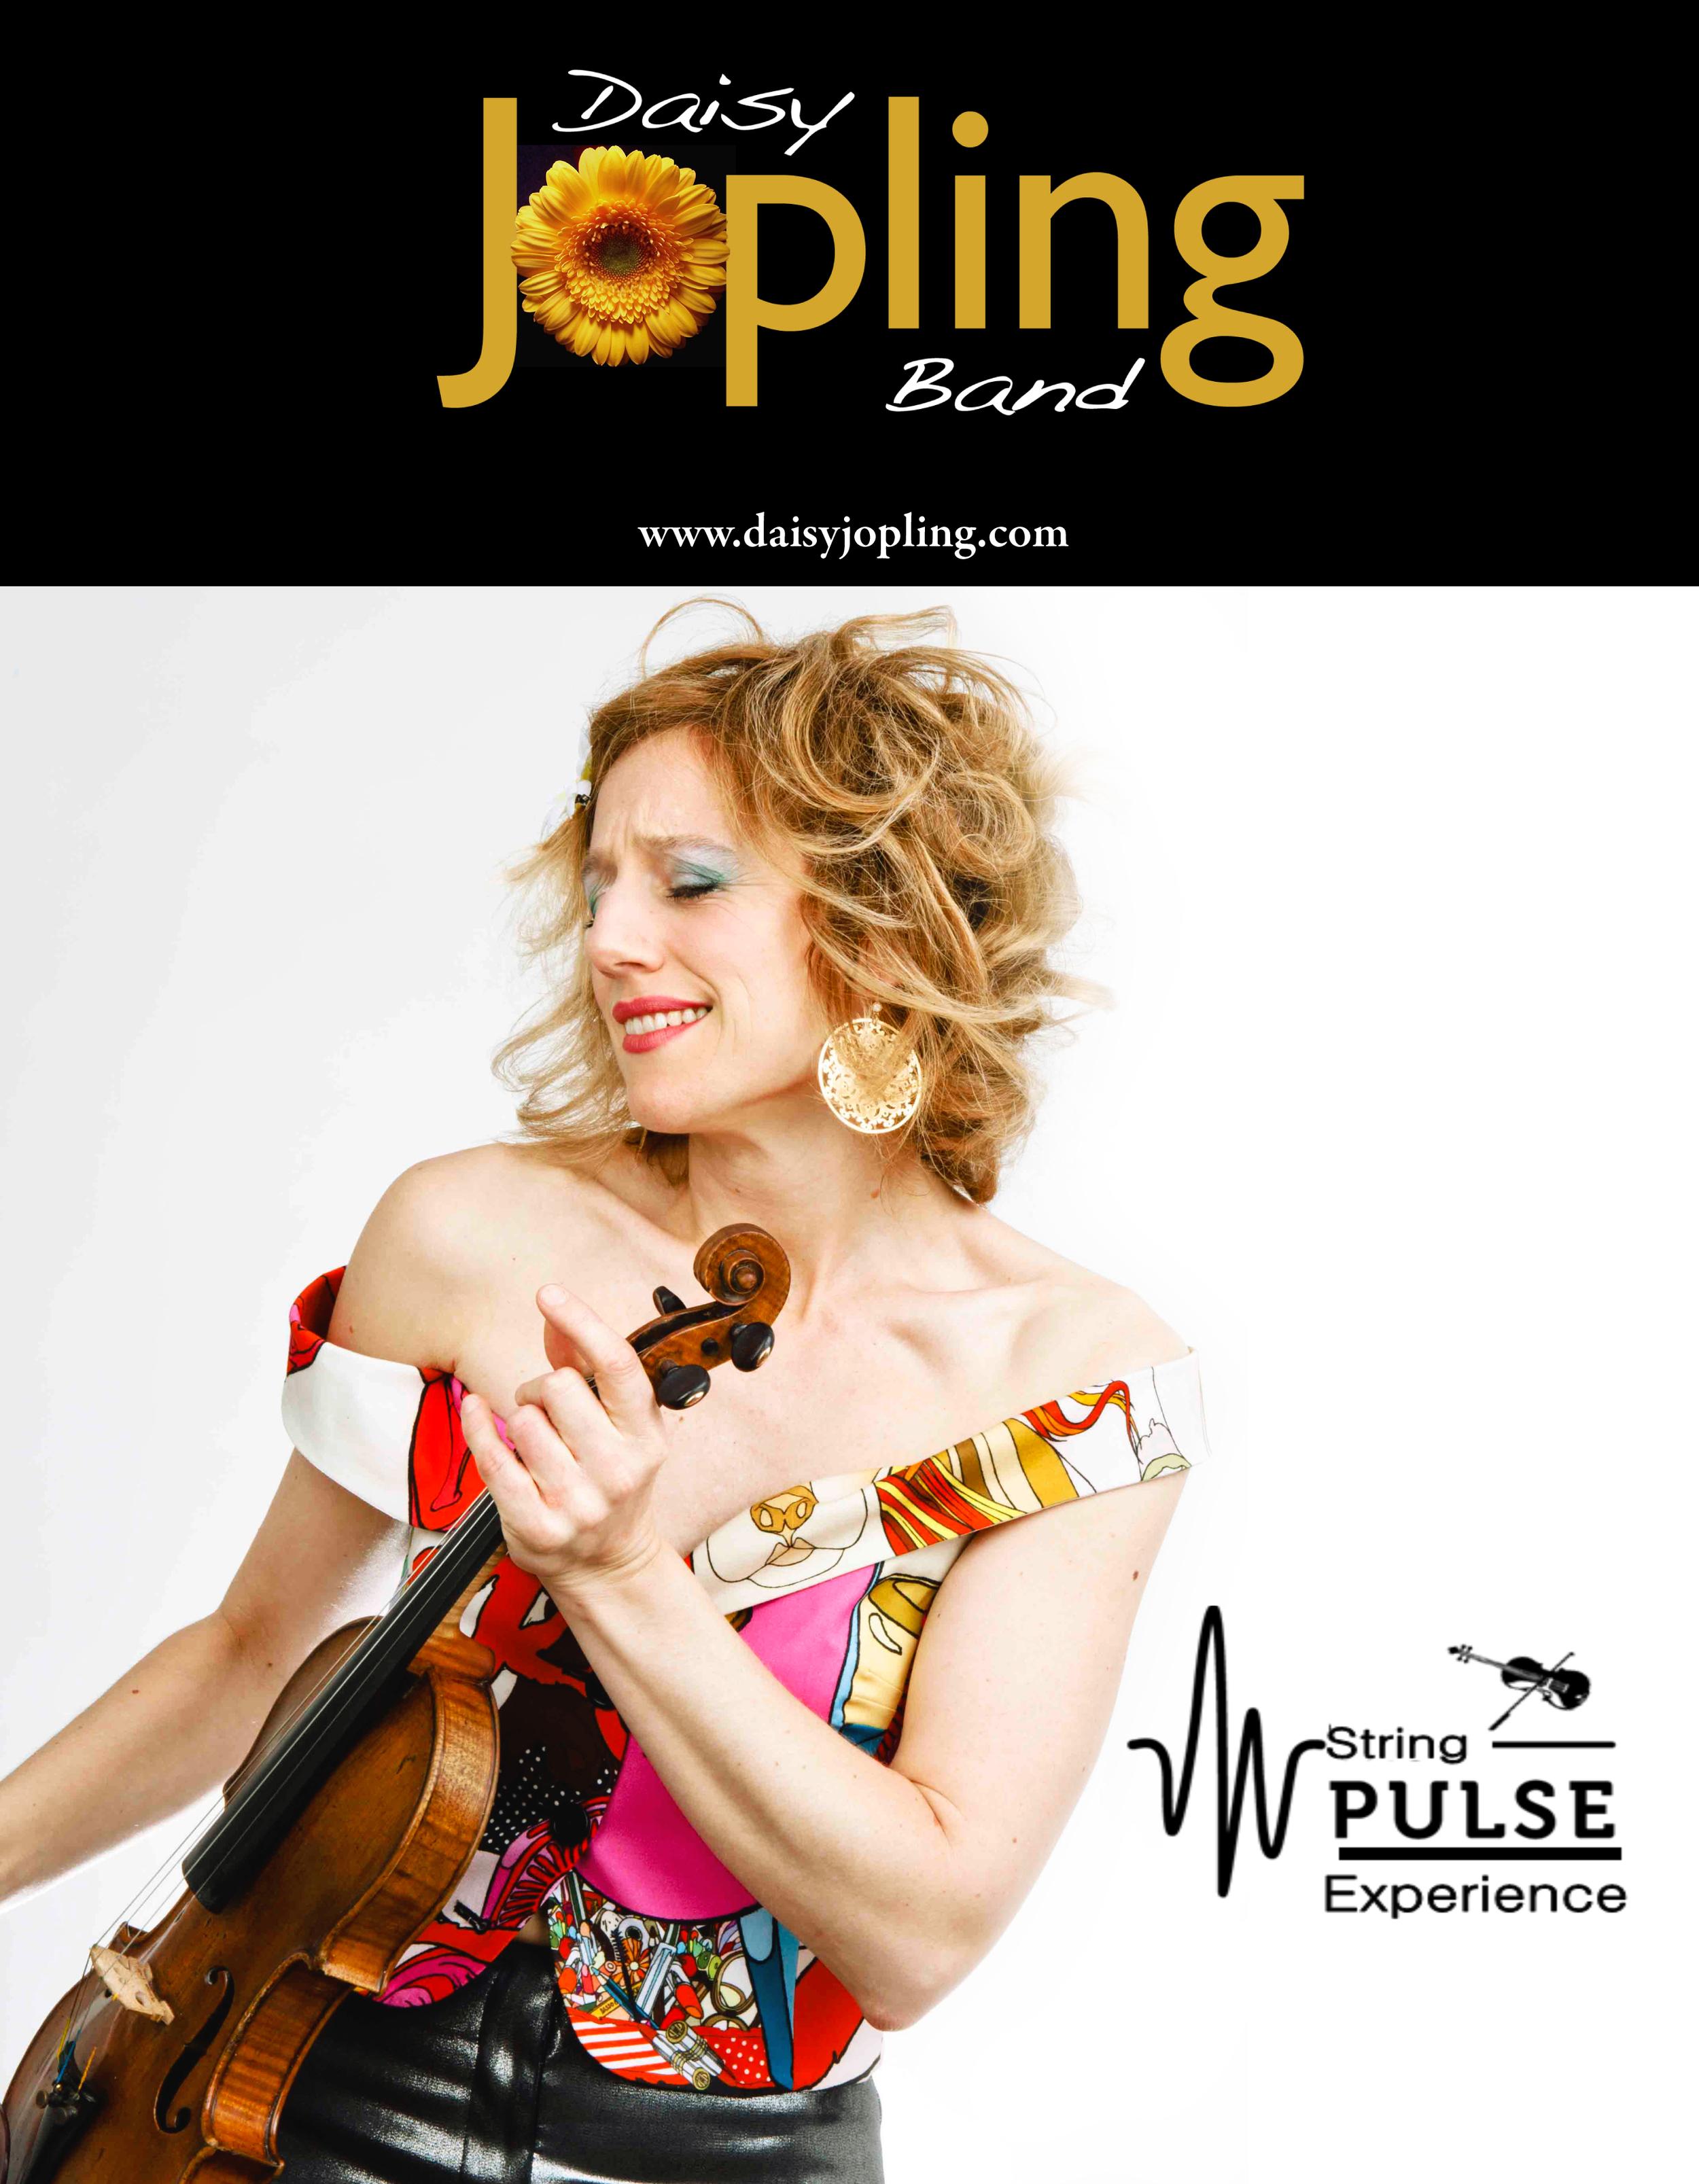 Daisy Jopling Band.jpg